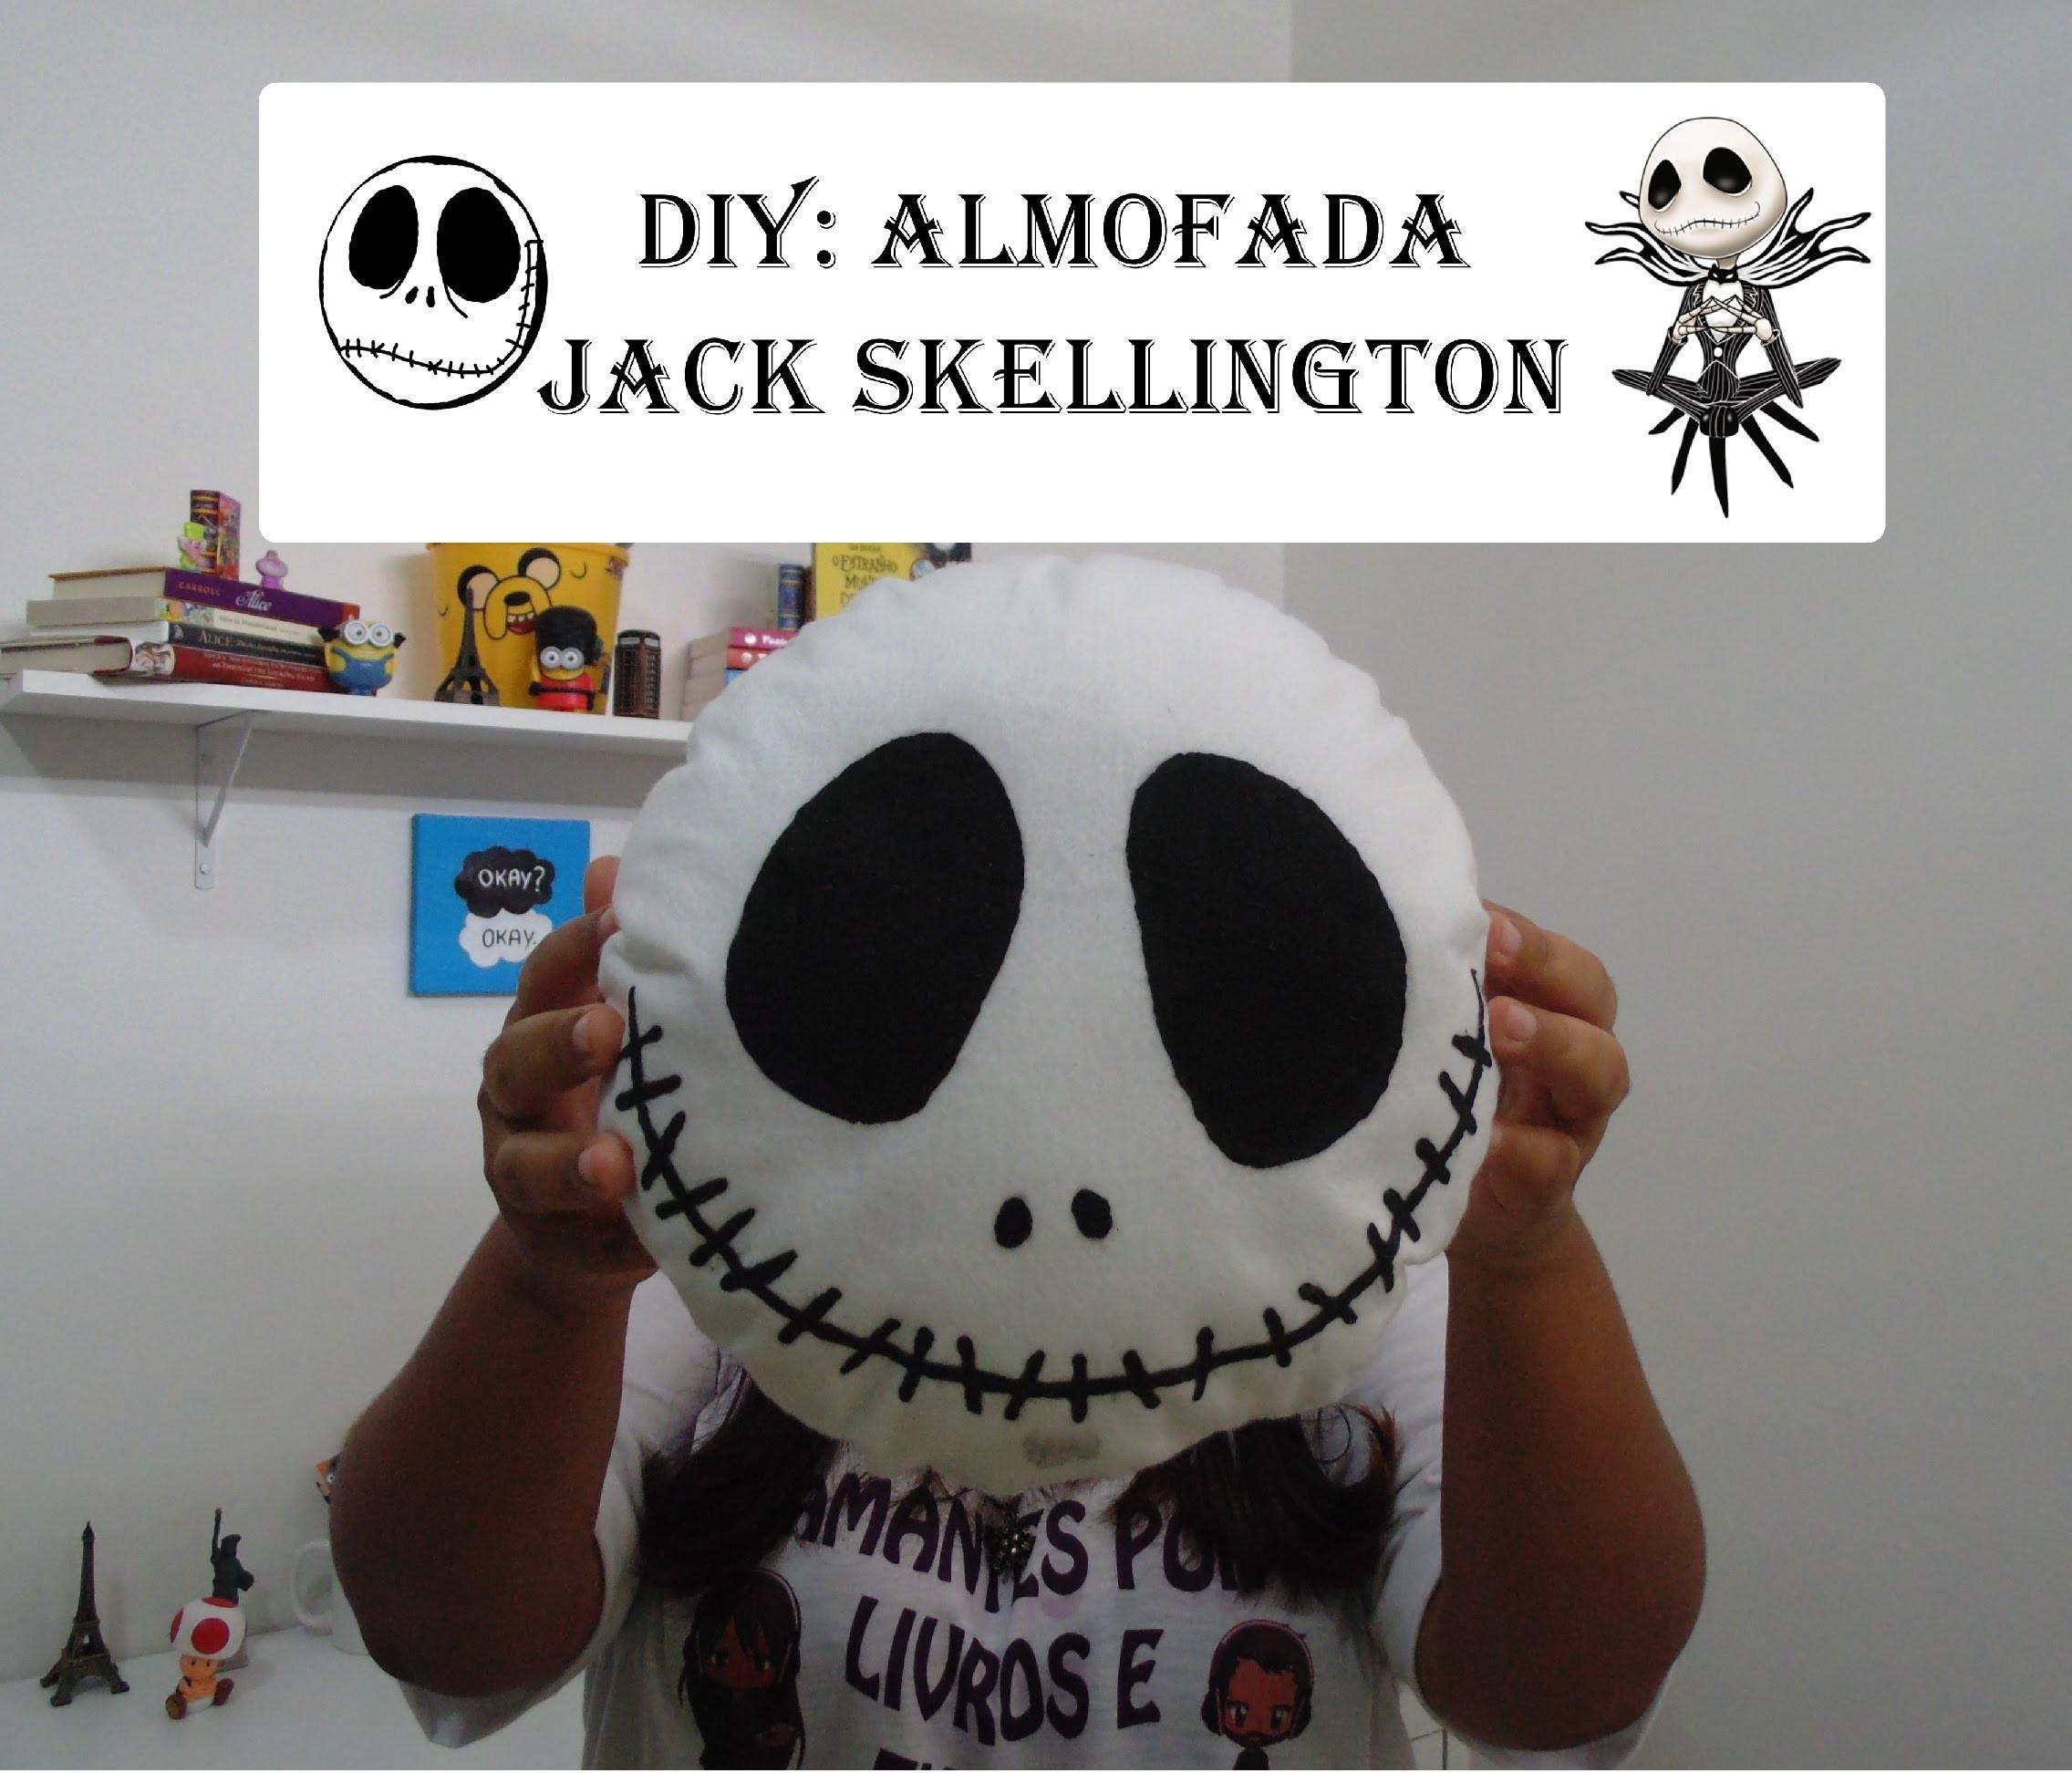 DIY Almofada do Jack skellington